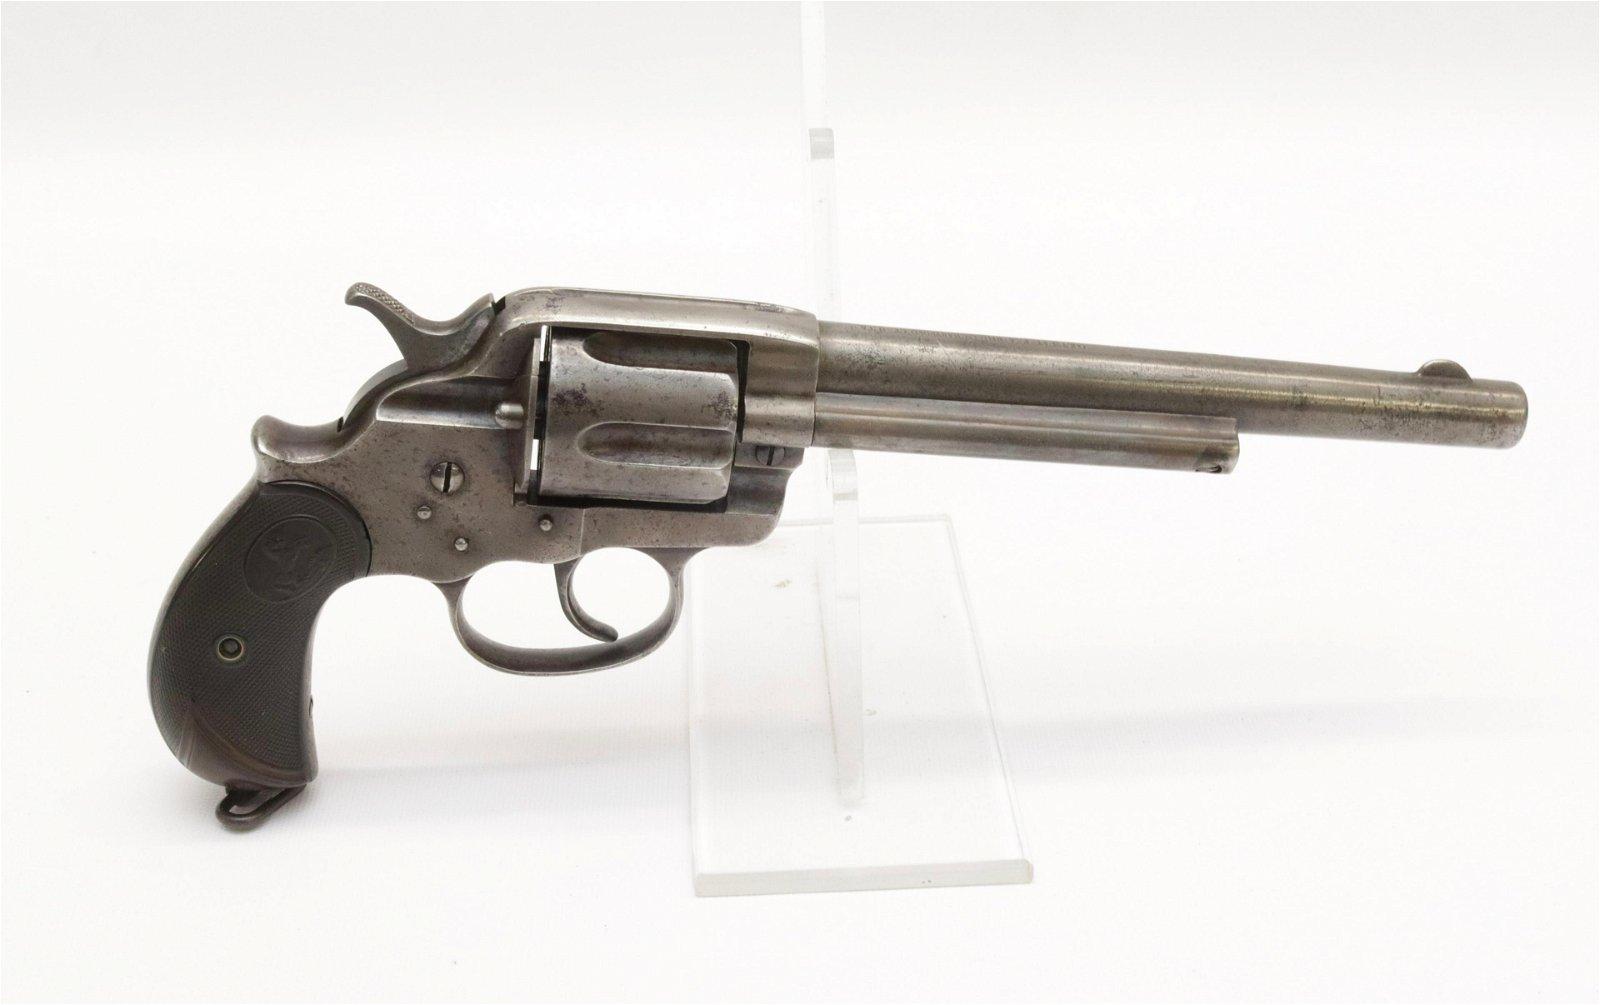 COLT MODEL 1878 FRONTIER DA REVOLVER